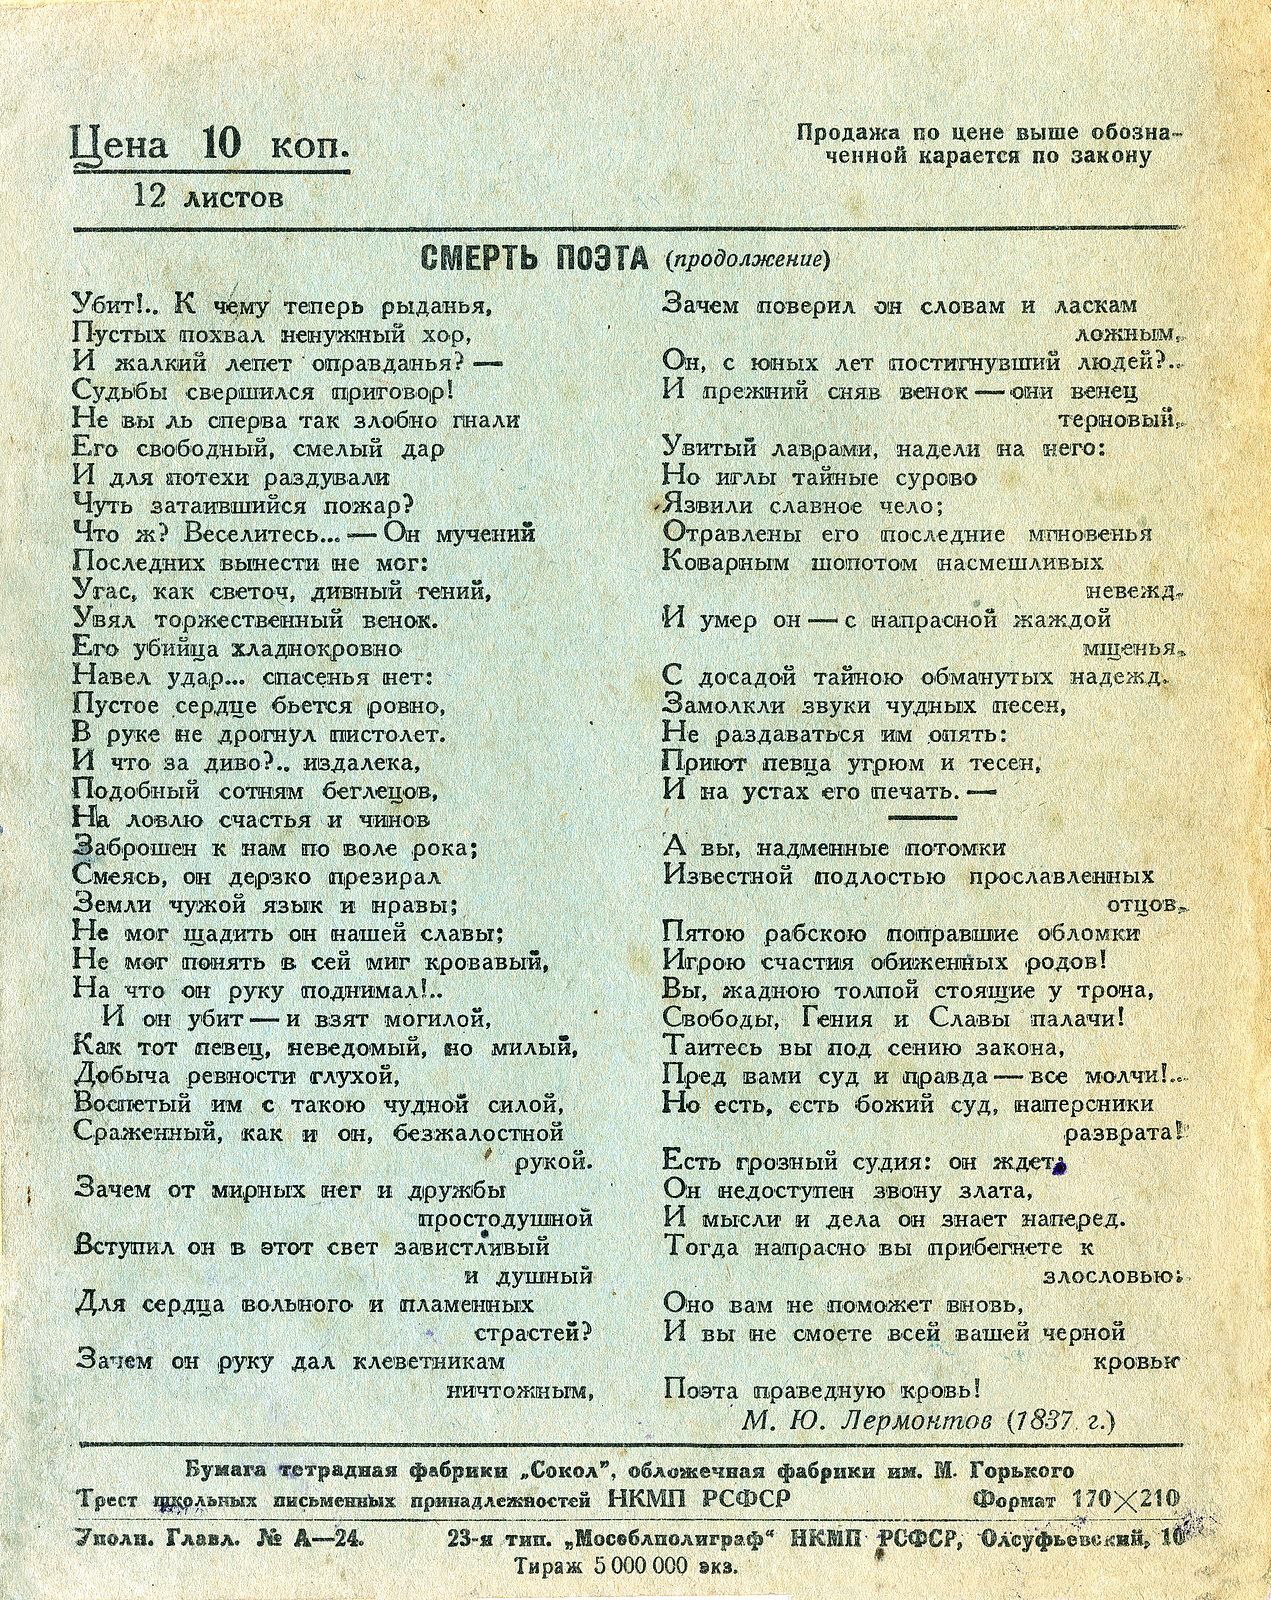 Тетрадь Пушкин (8), оборот